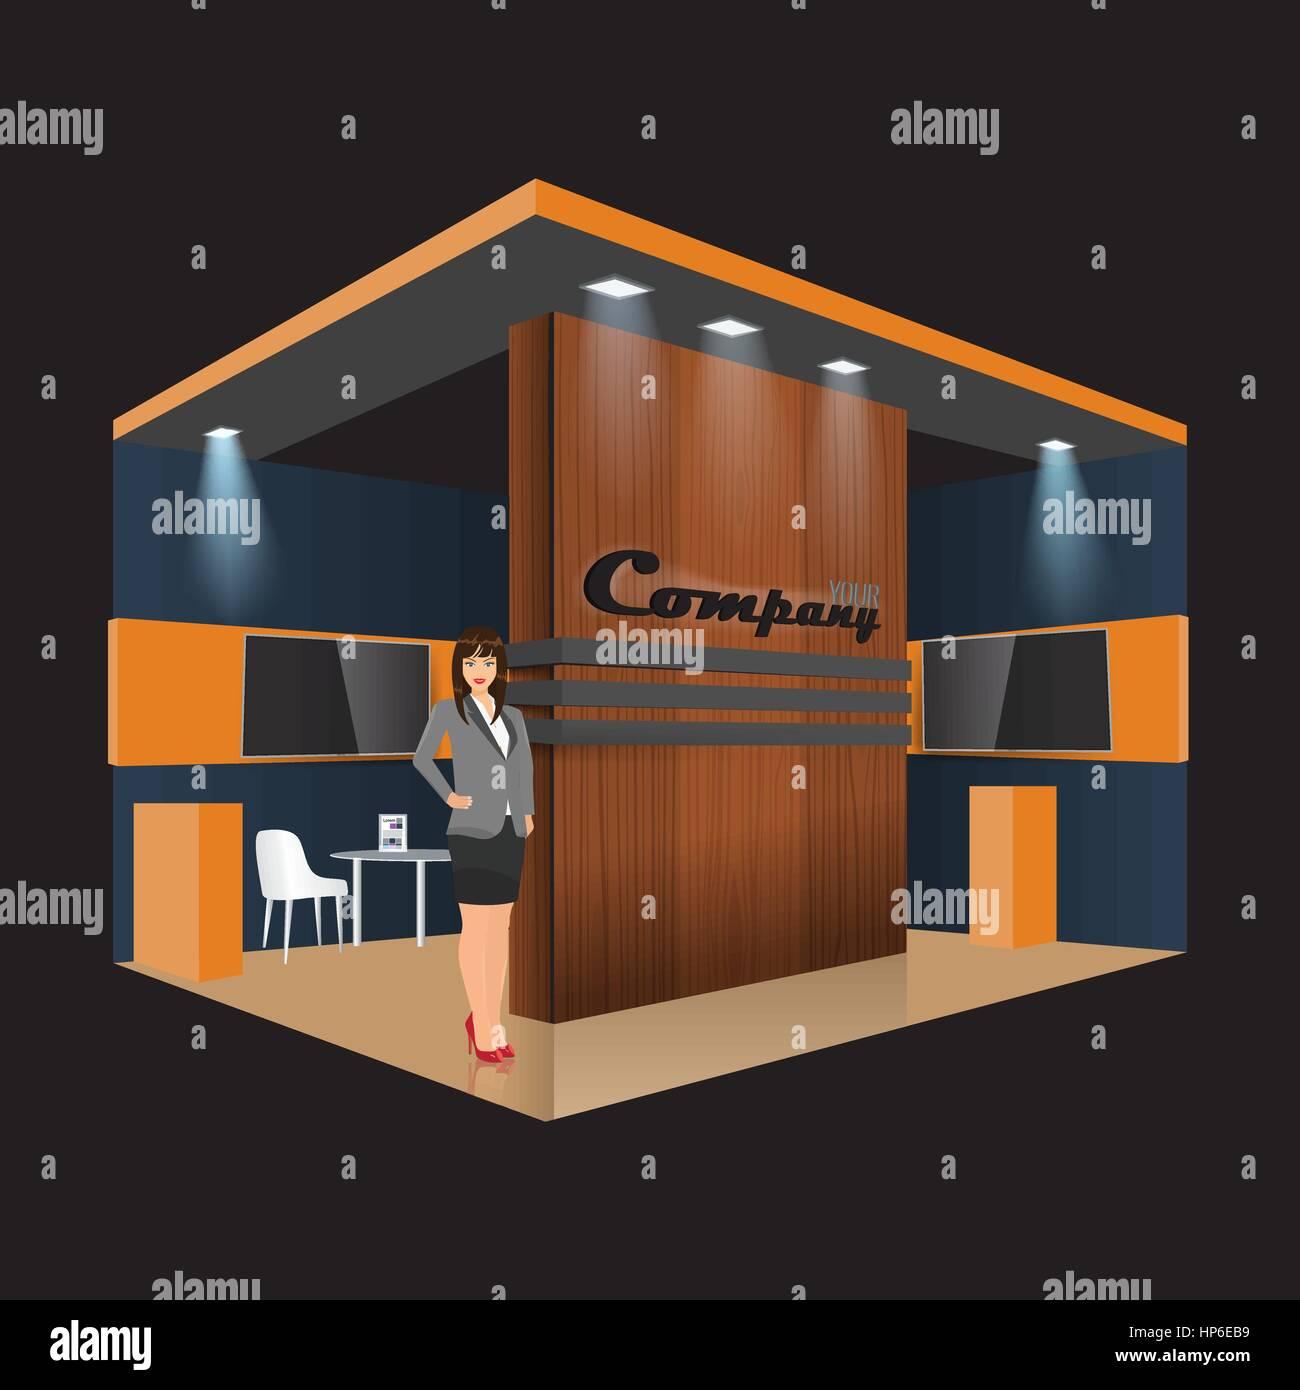 Exhibition Stand Design Furniture : Unique creative wooden exhibition stand display design info board